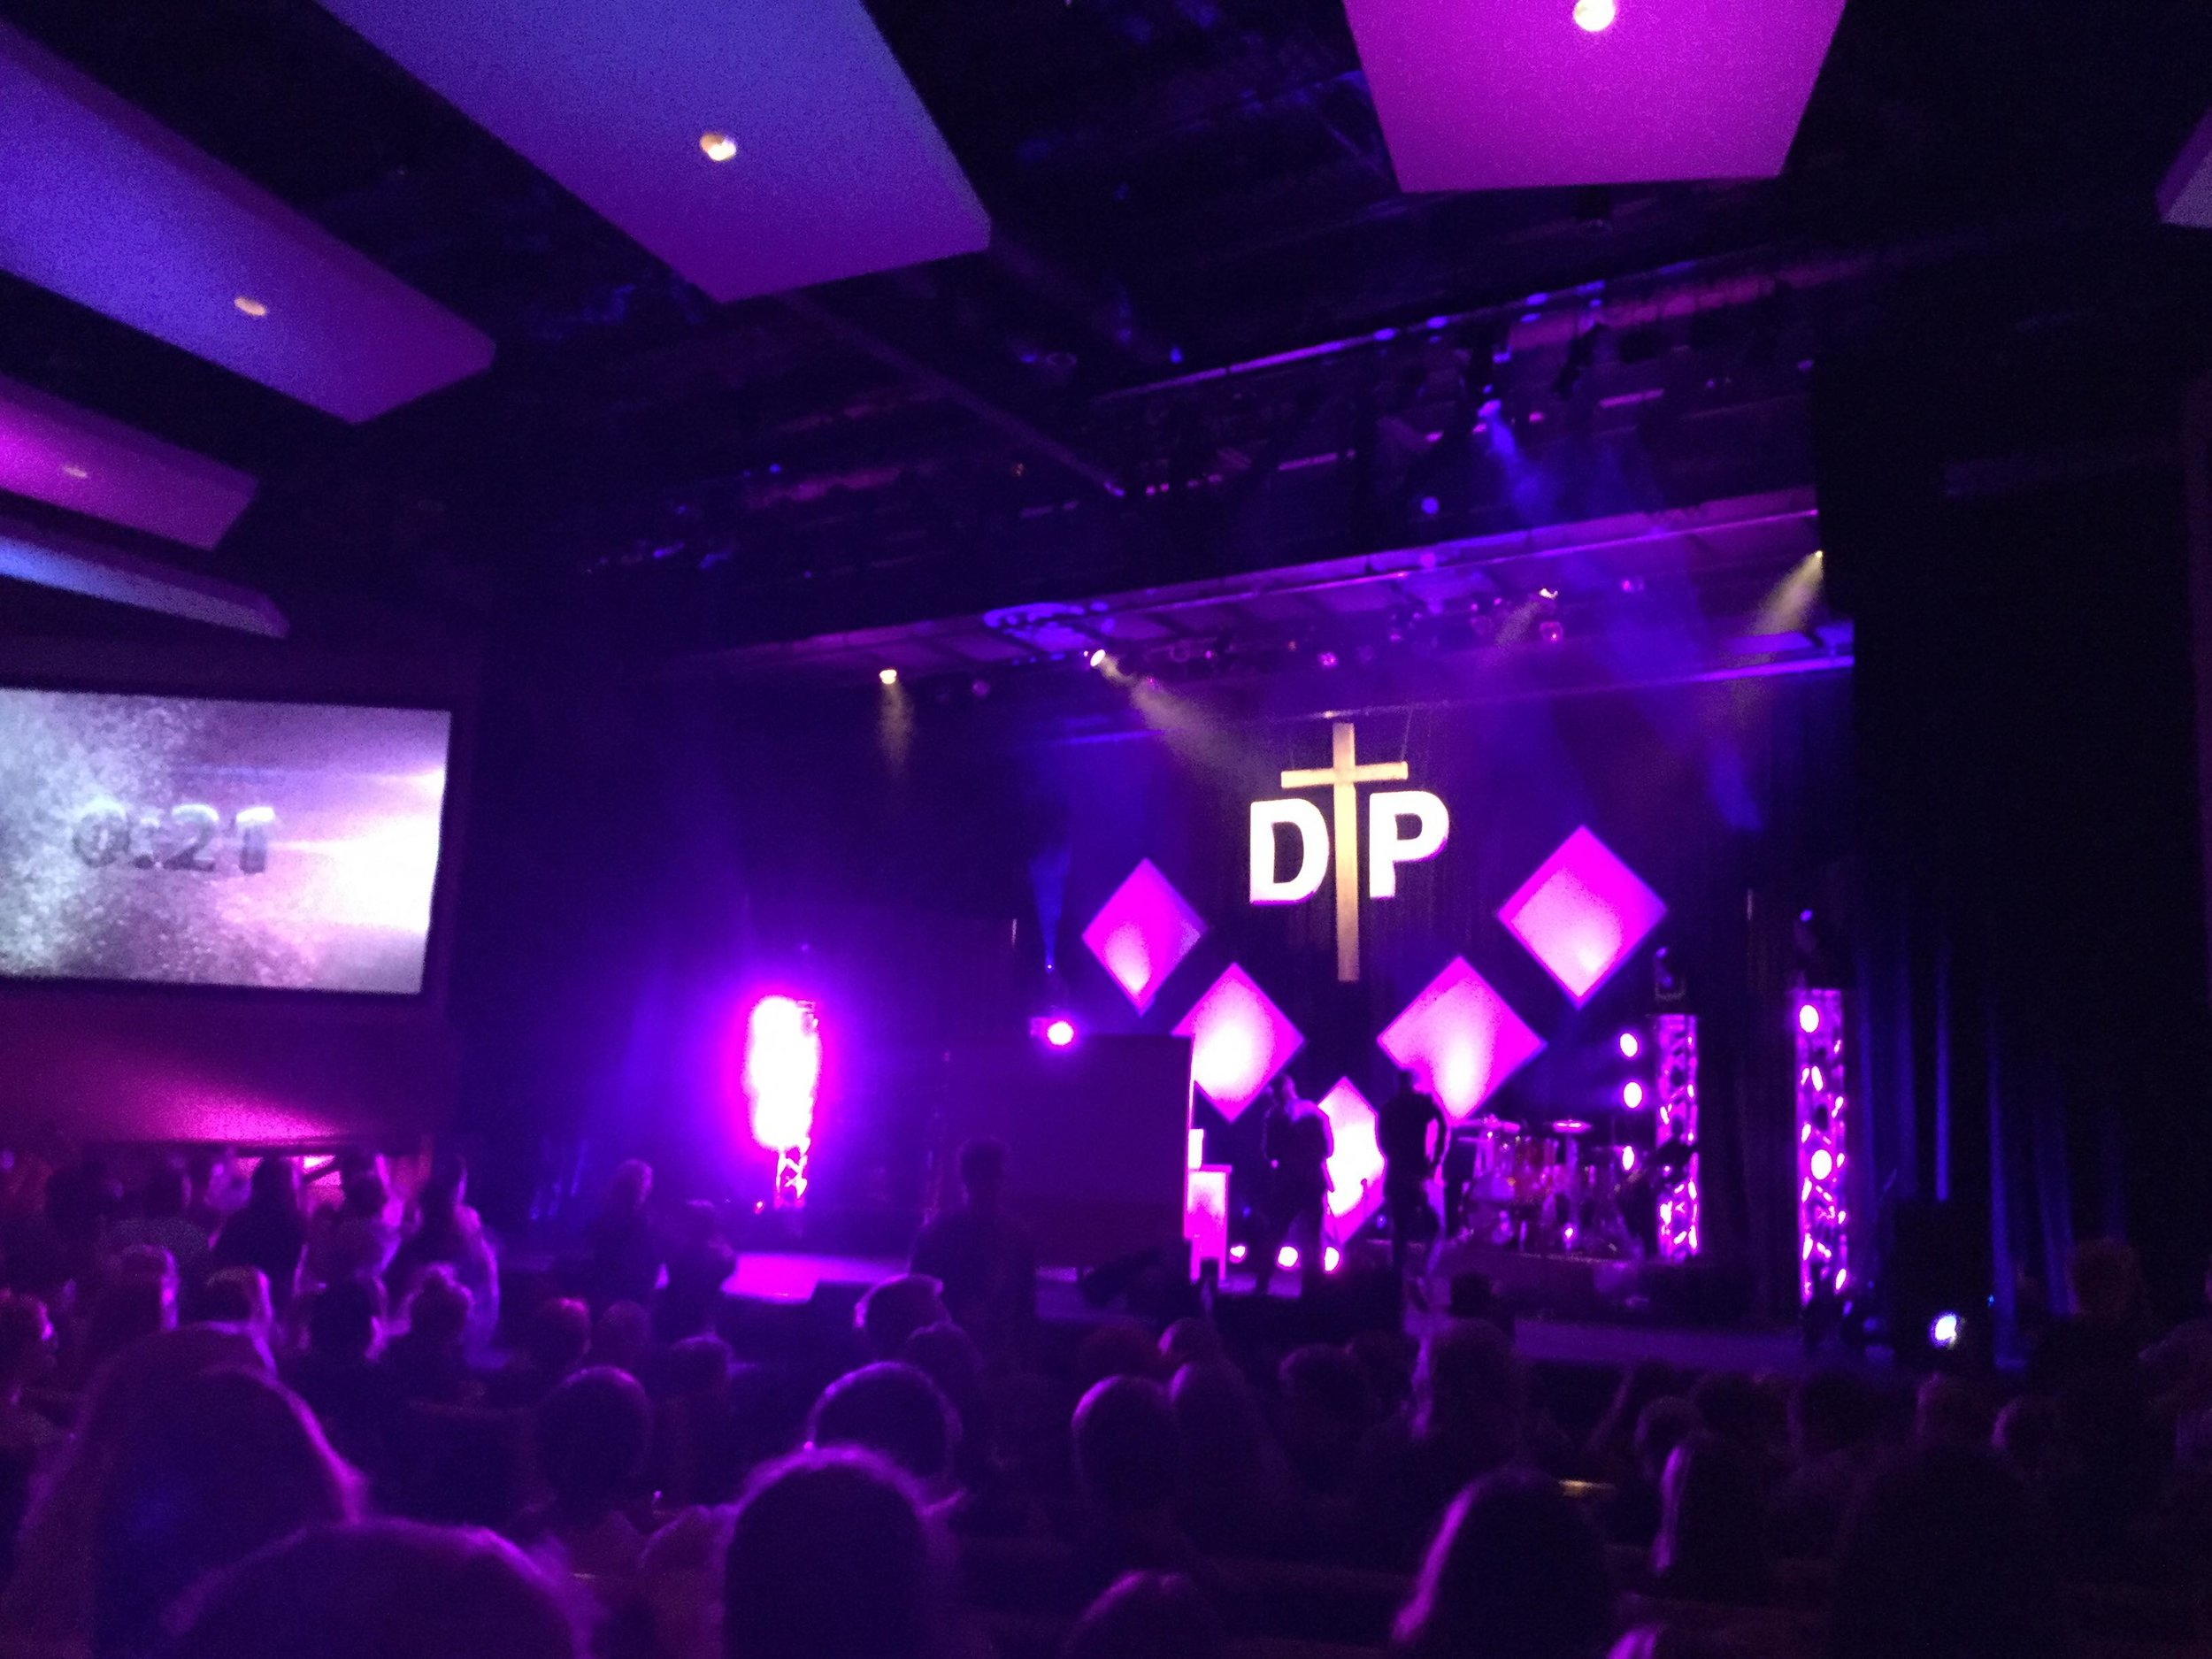 DTP 2017